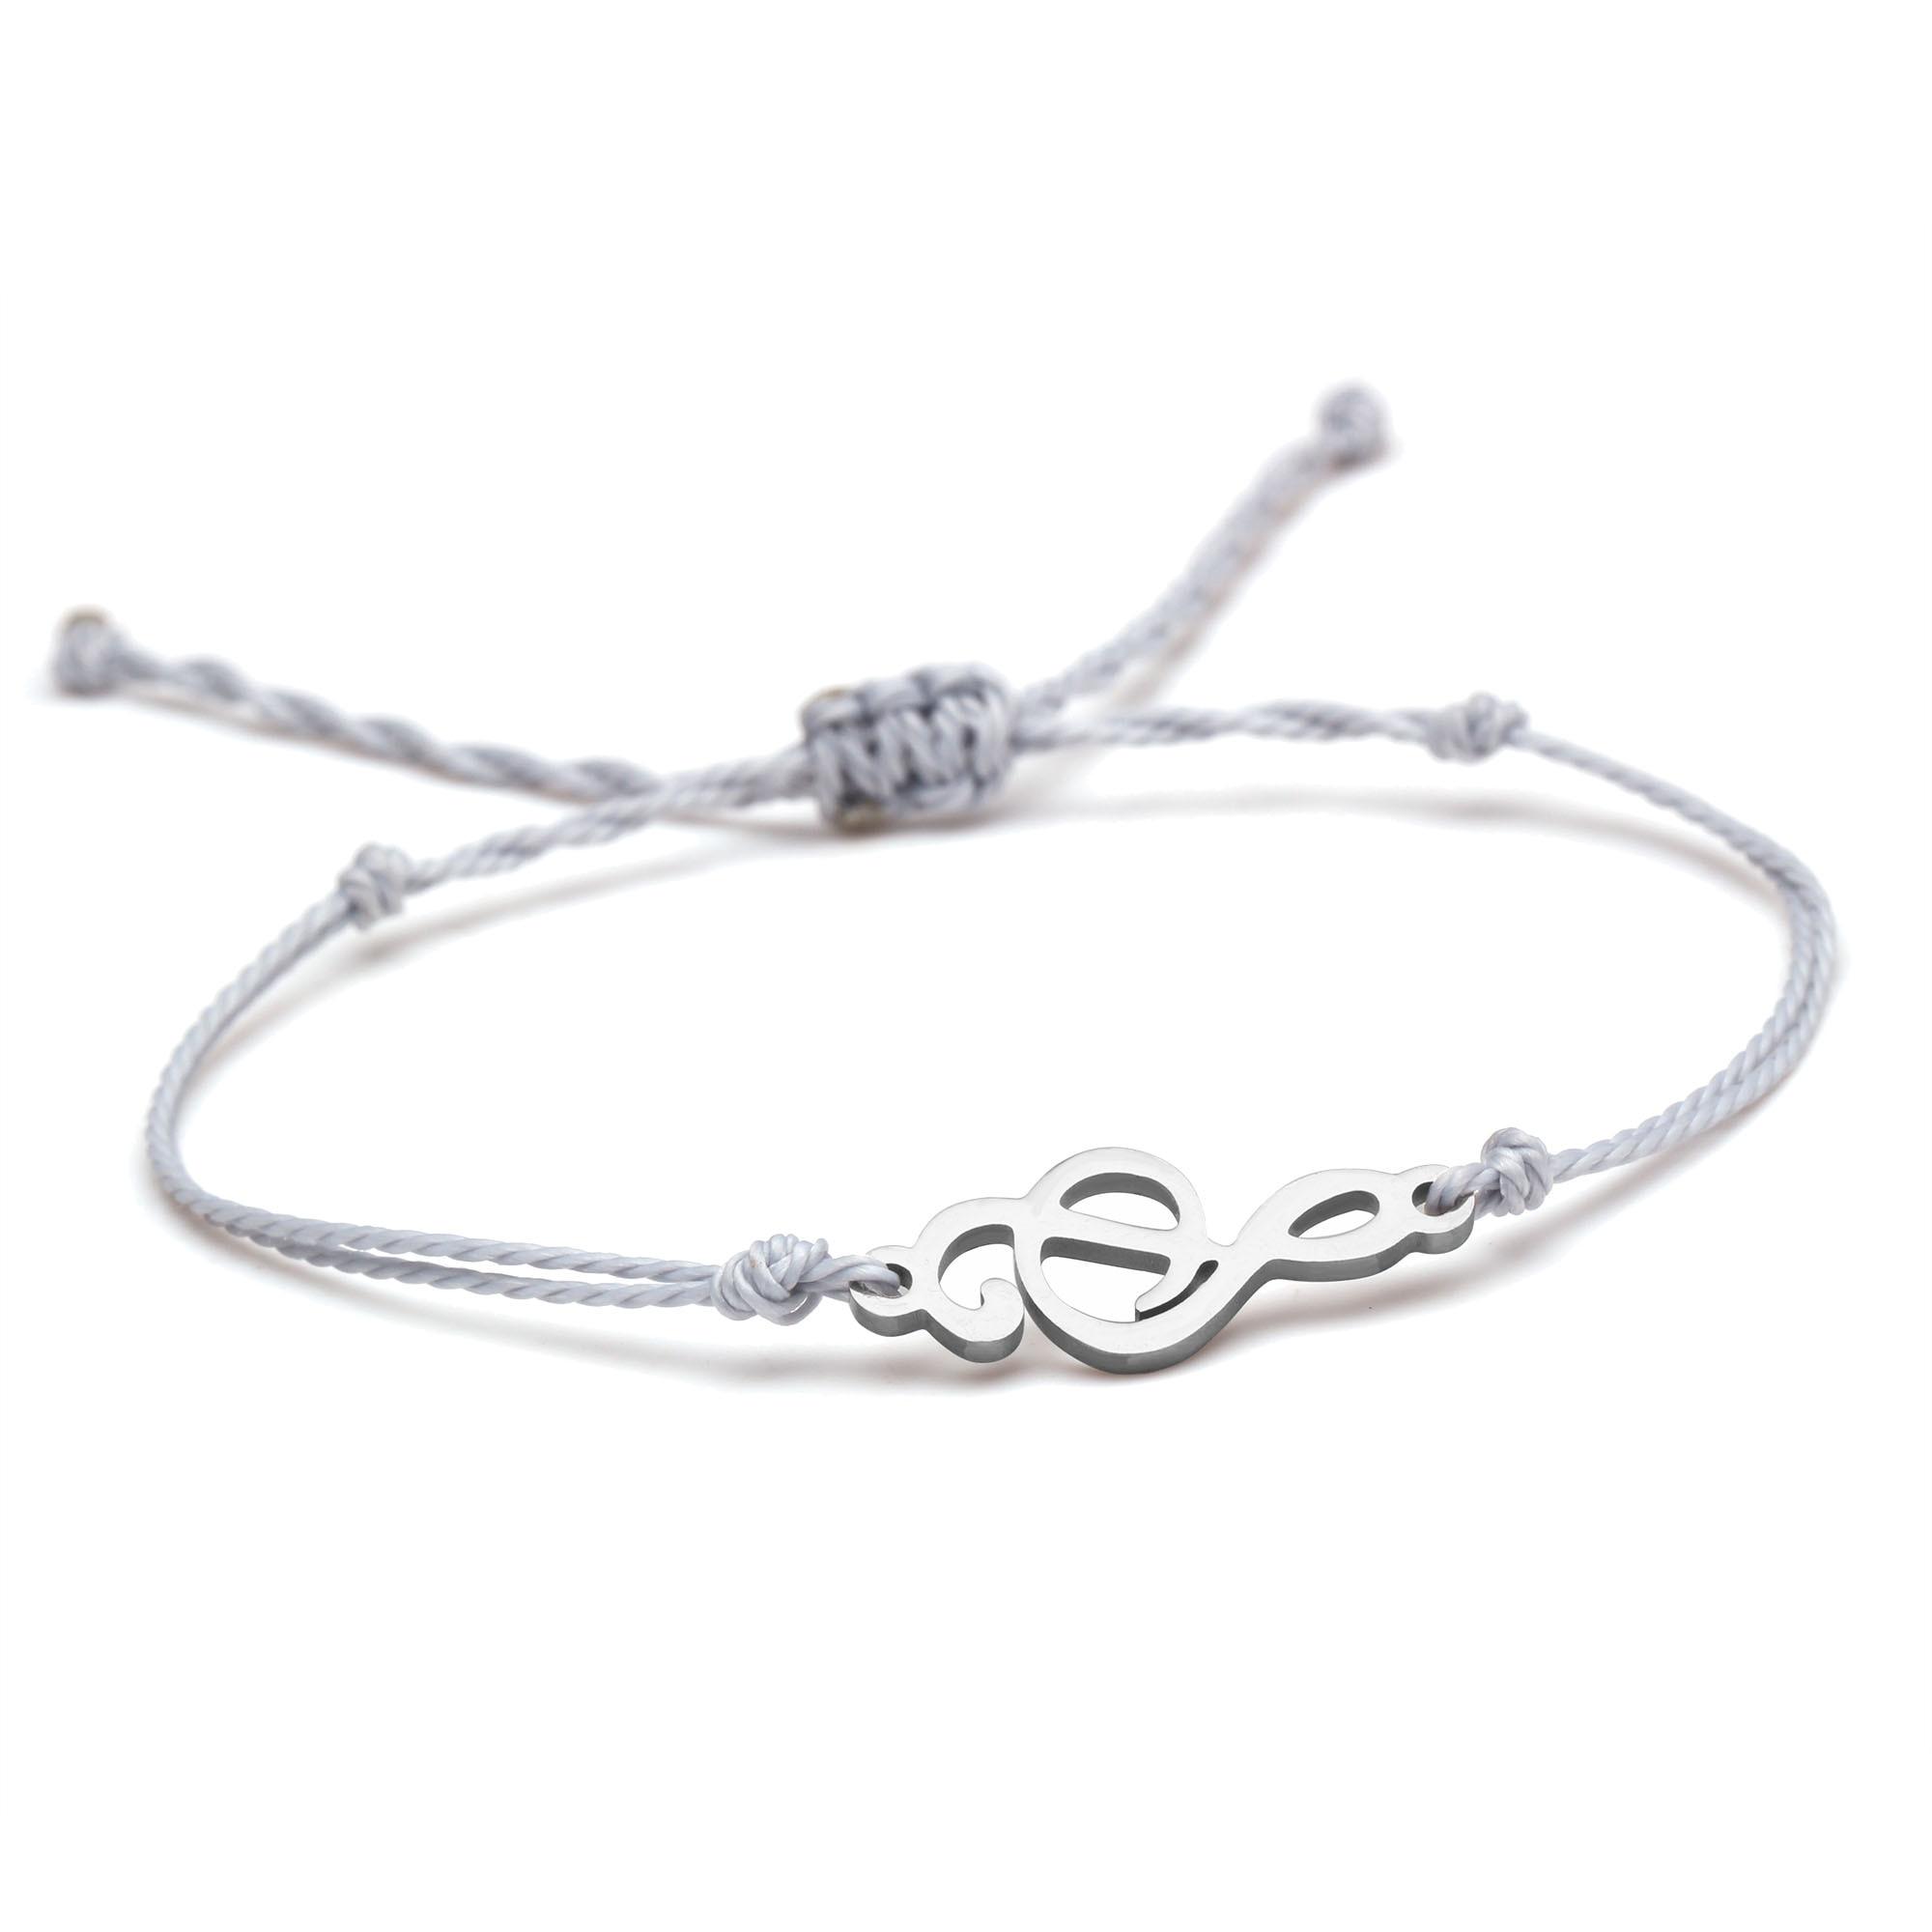 Bonita pulsera con notación Musical de acero inoxidable para mujer, joyería artesanal hecha a mano